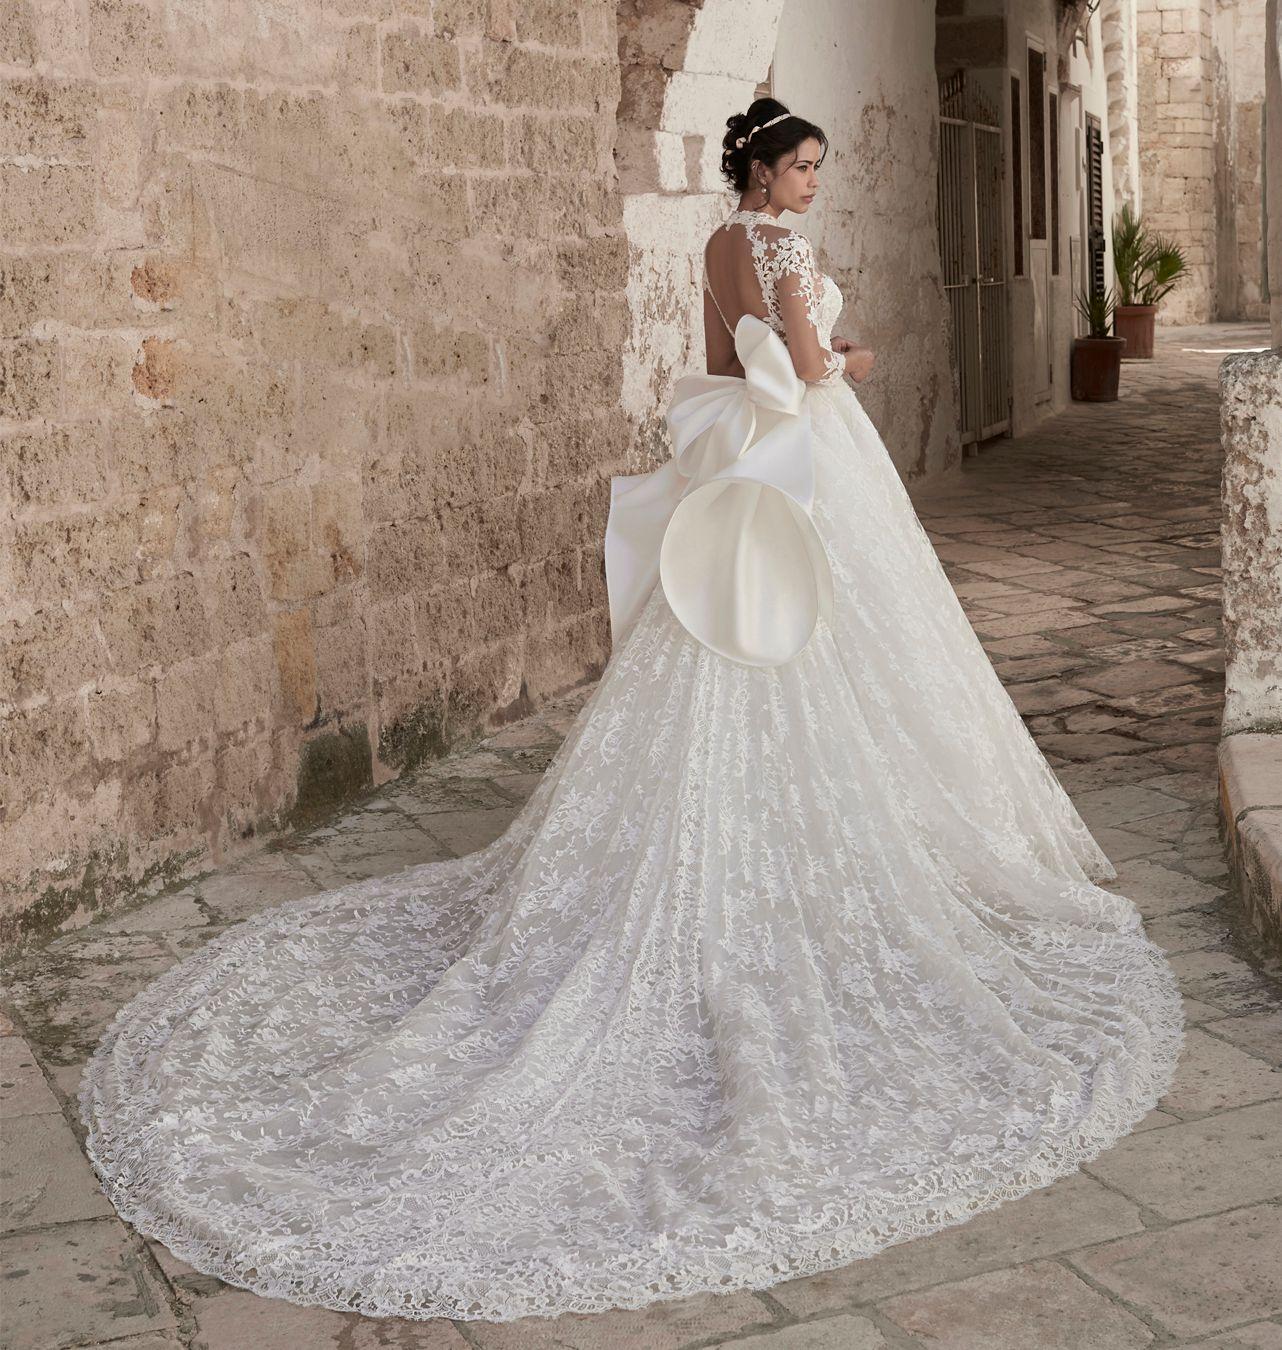 2020 A Line Beach Wedding Dresses Jewel Neck Hollow Back Long Sleeve Bow Appliques Tulle Wedding Dresses Court Train Boho Bridal Gowns